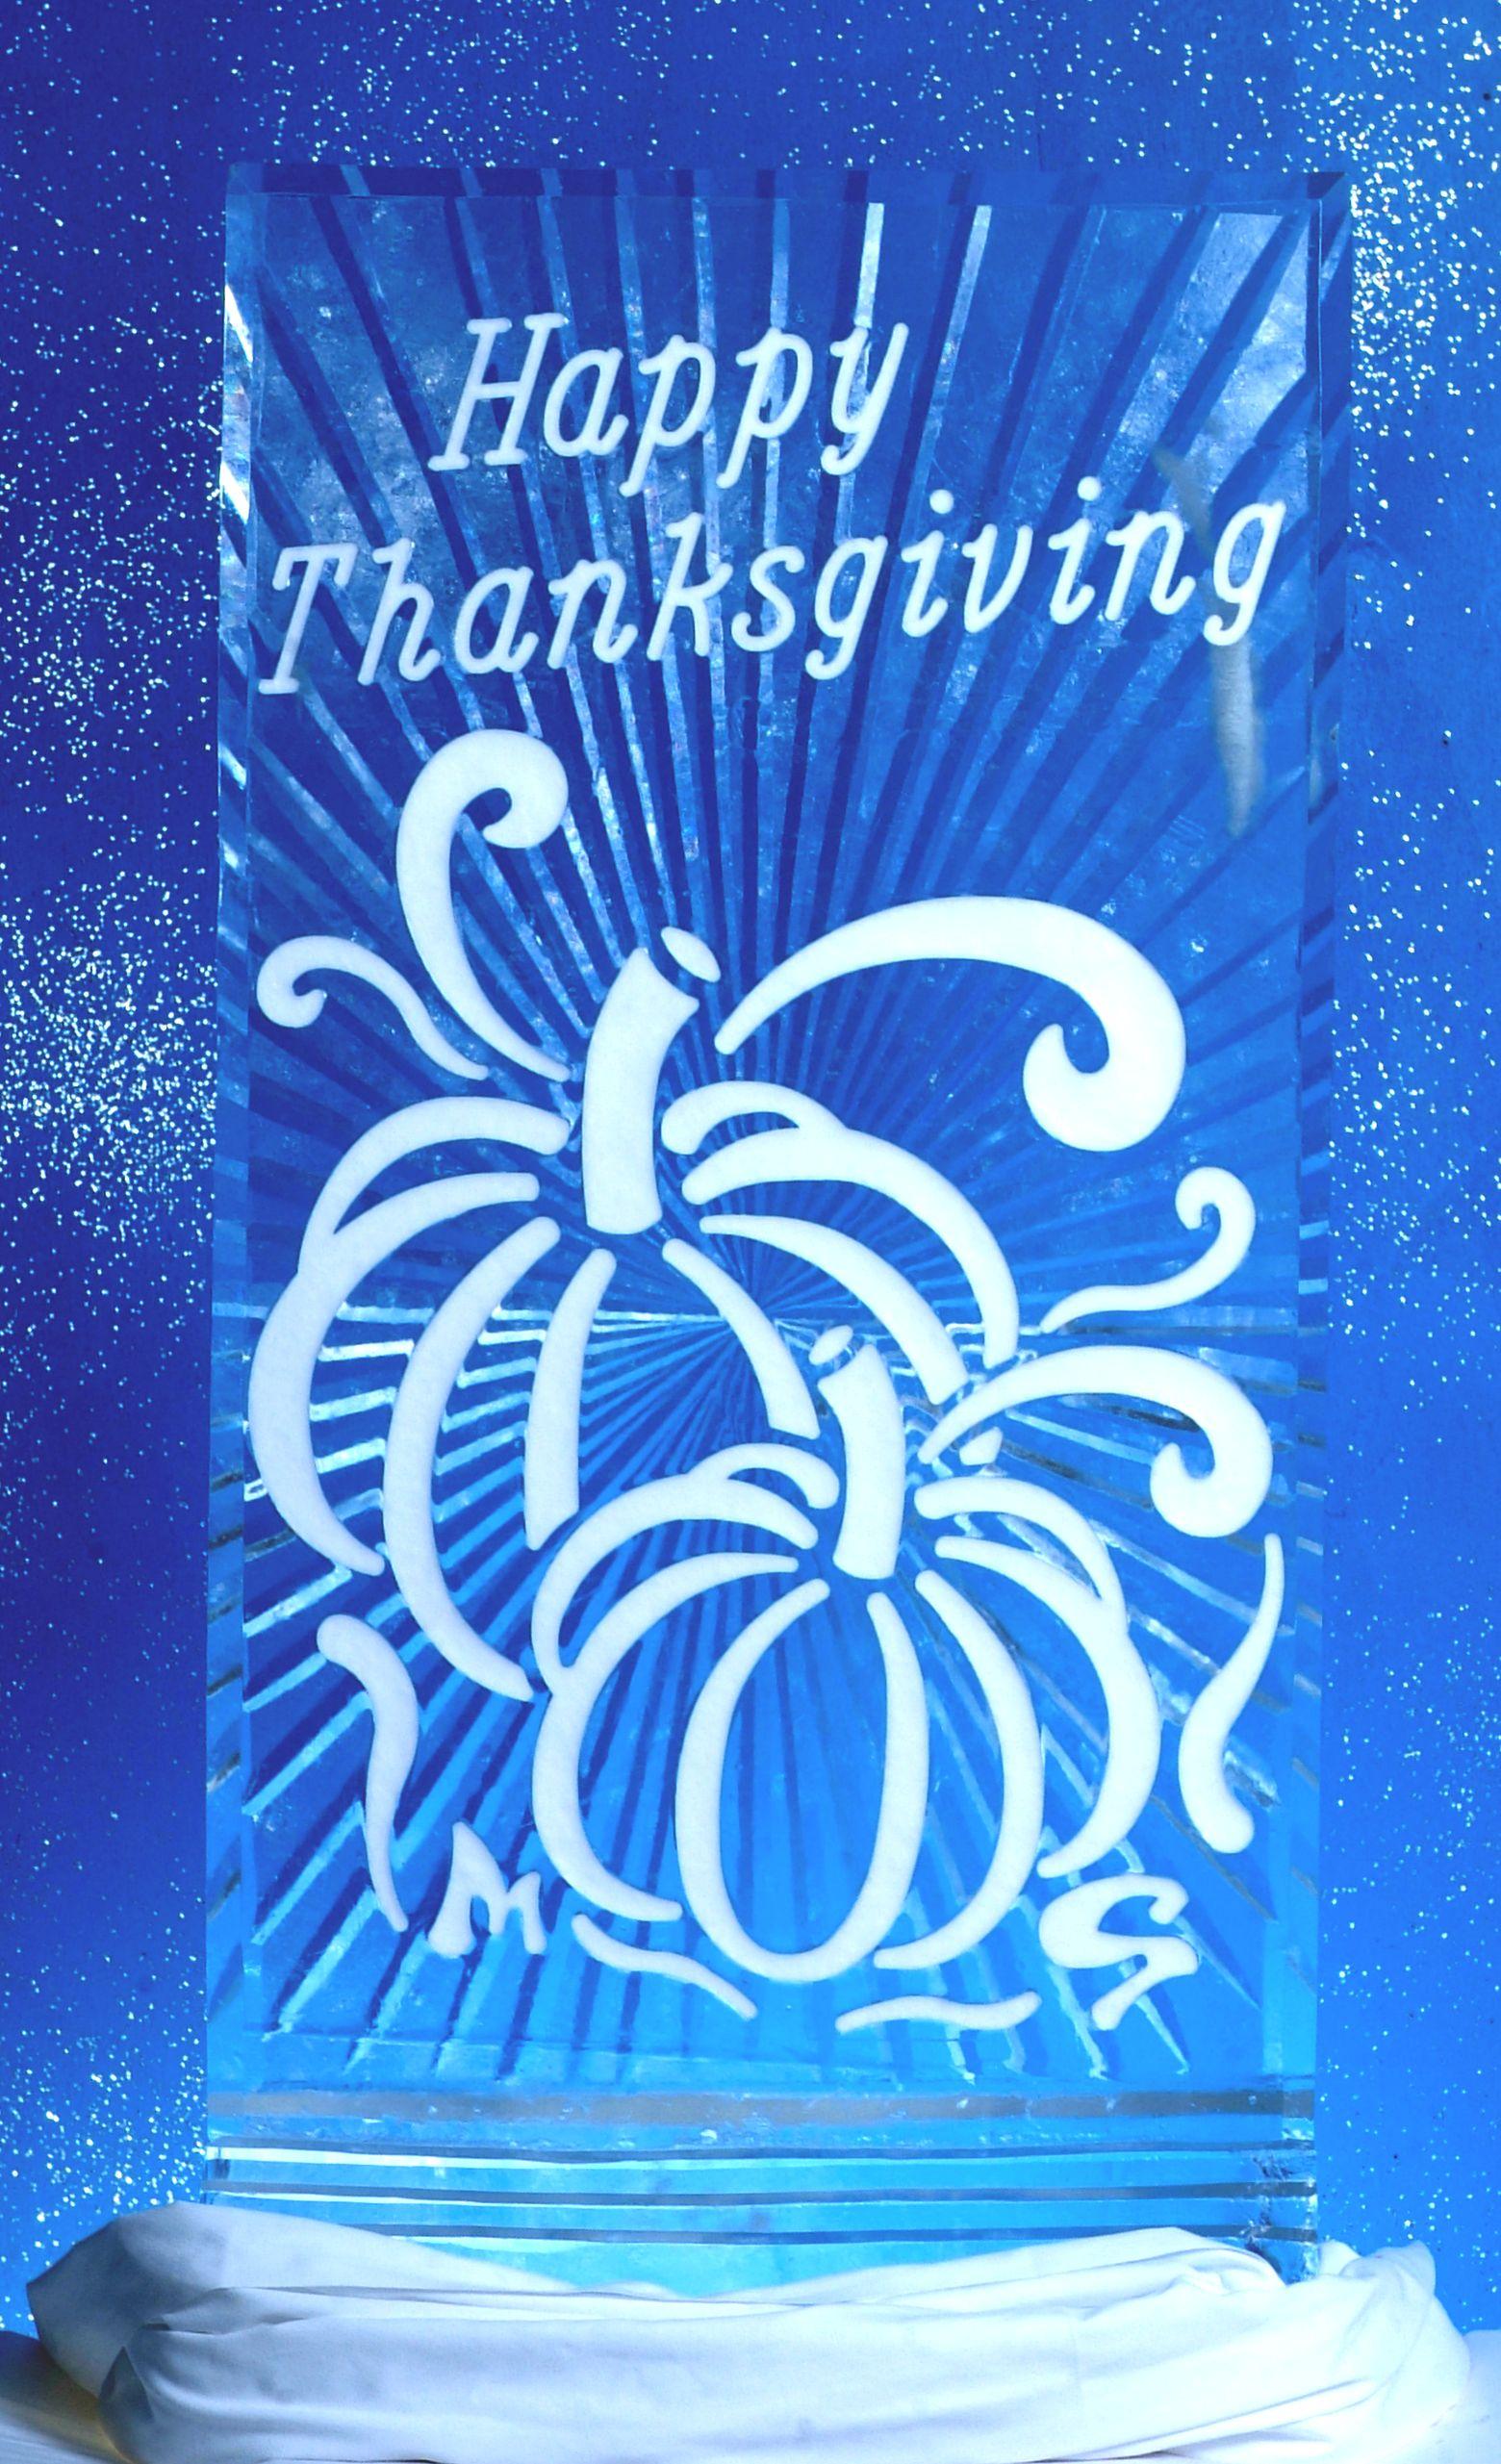 Thanksgiving Pumpkins in Snowfill